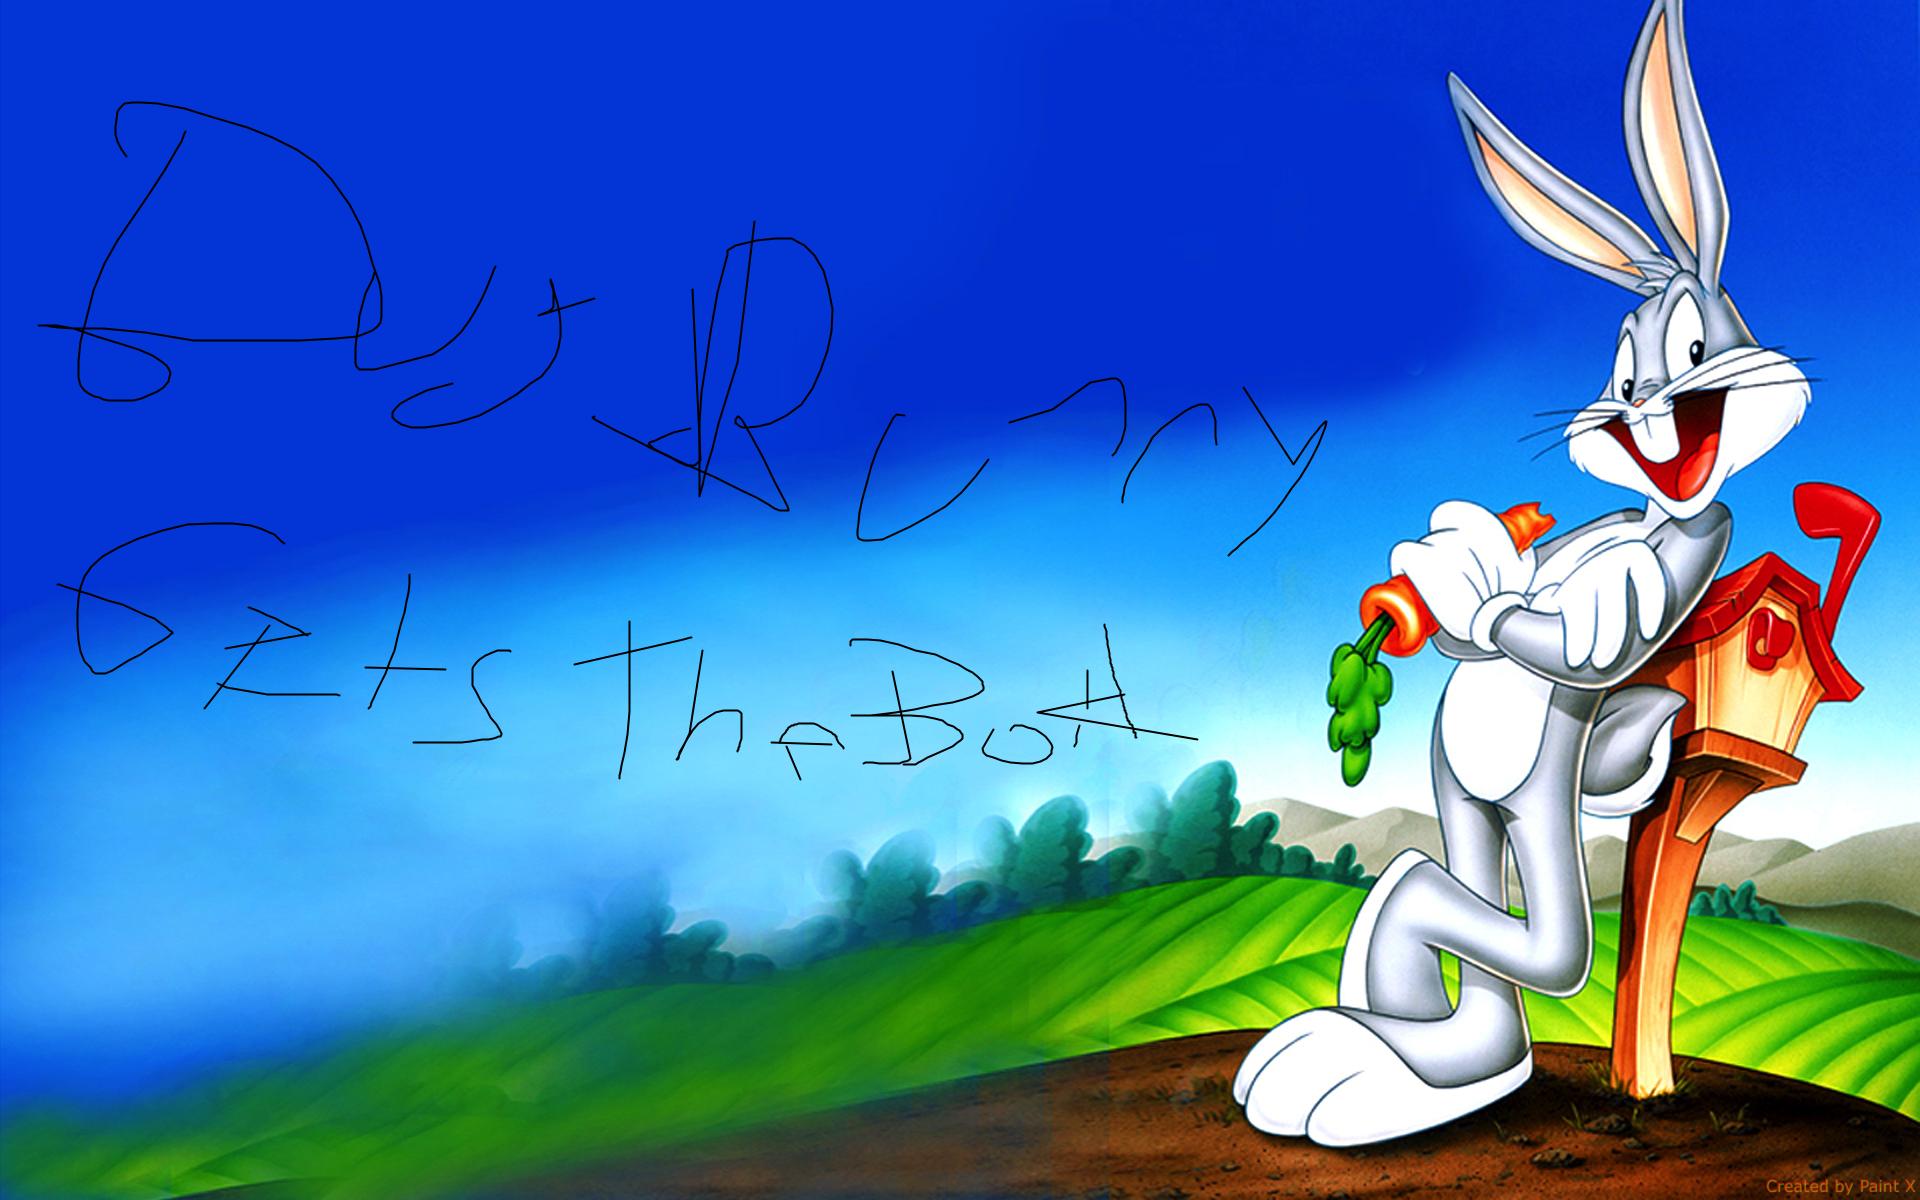 Looney-Tunes-Bugs-Bunny-Cartoons-Desktop-HD